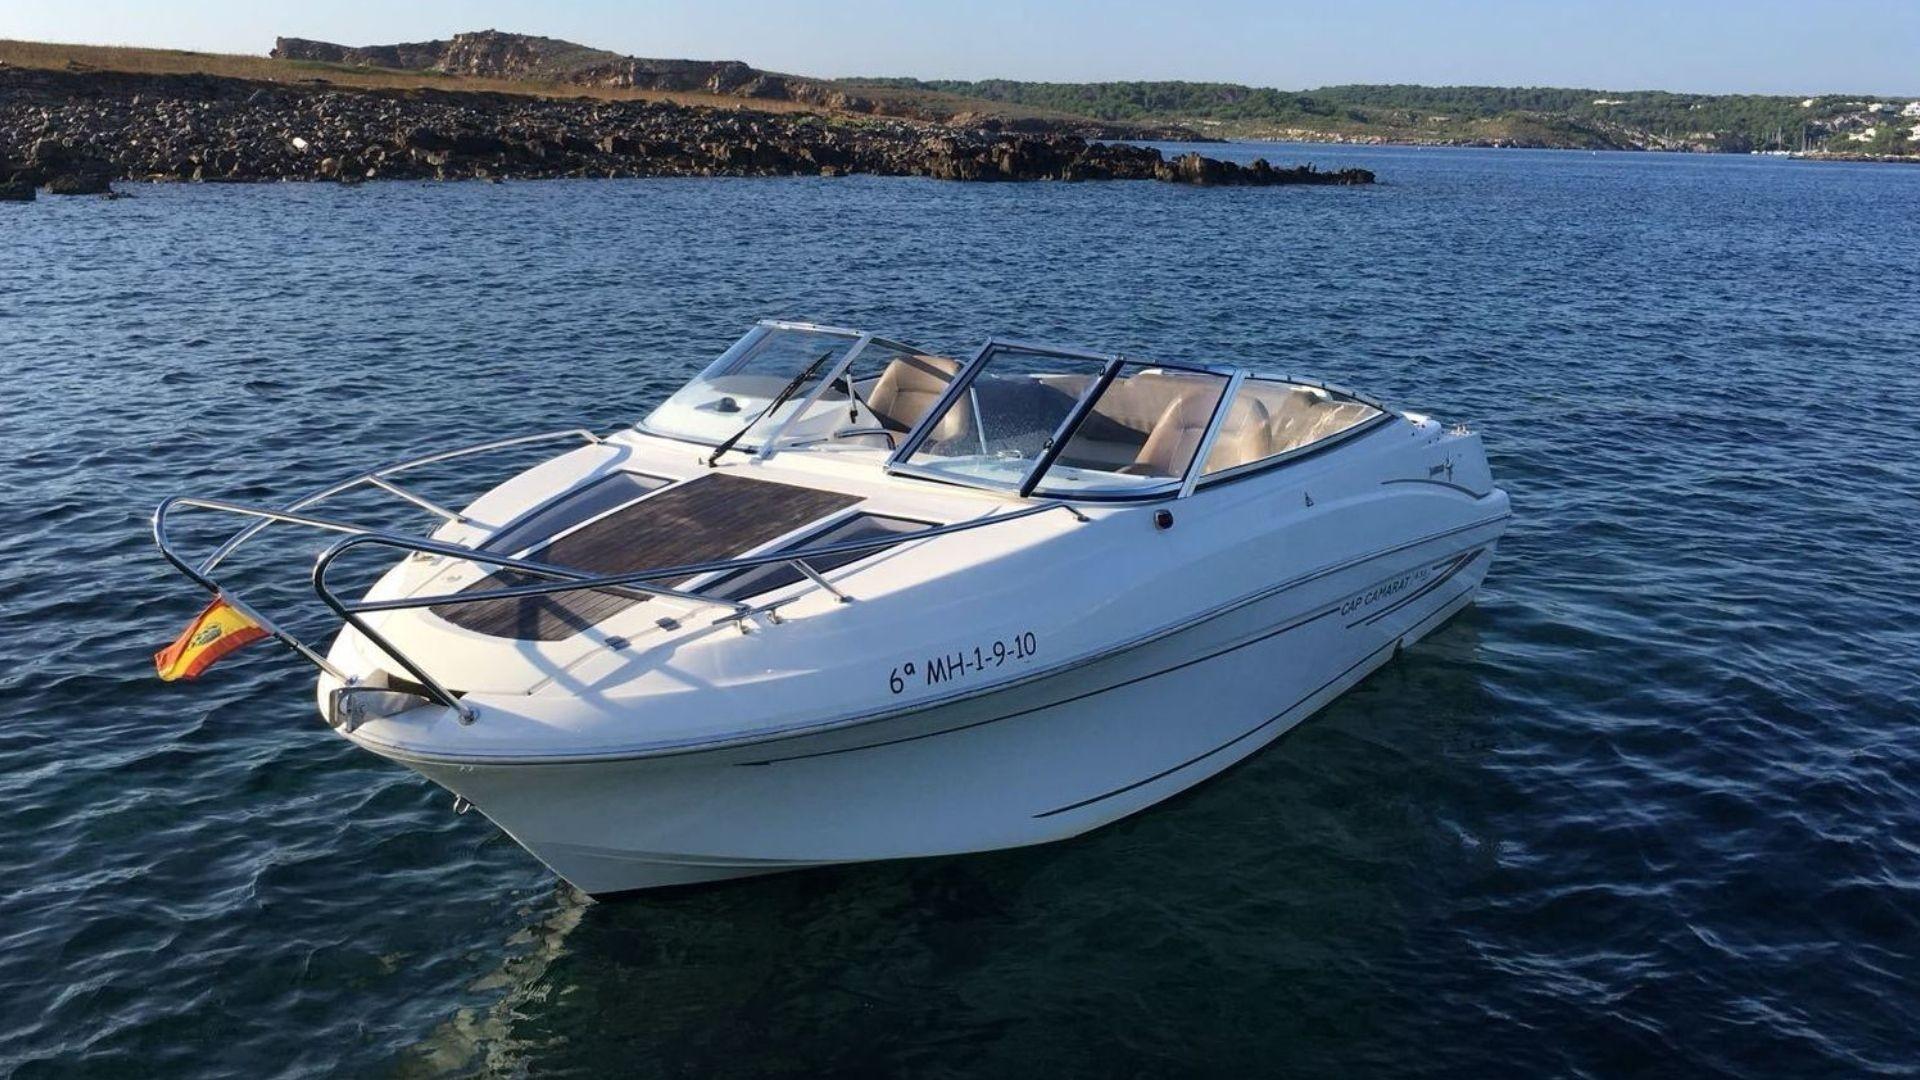 Alquiler de barcos en Menorca